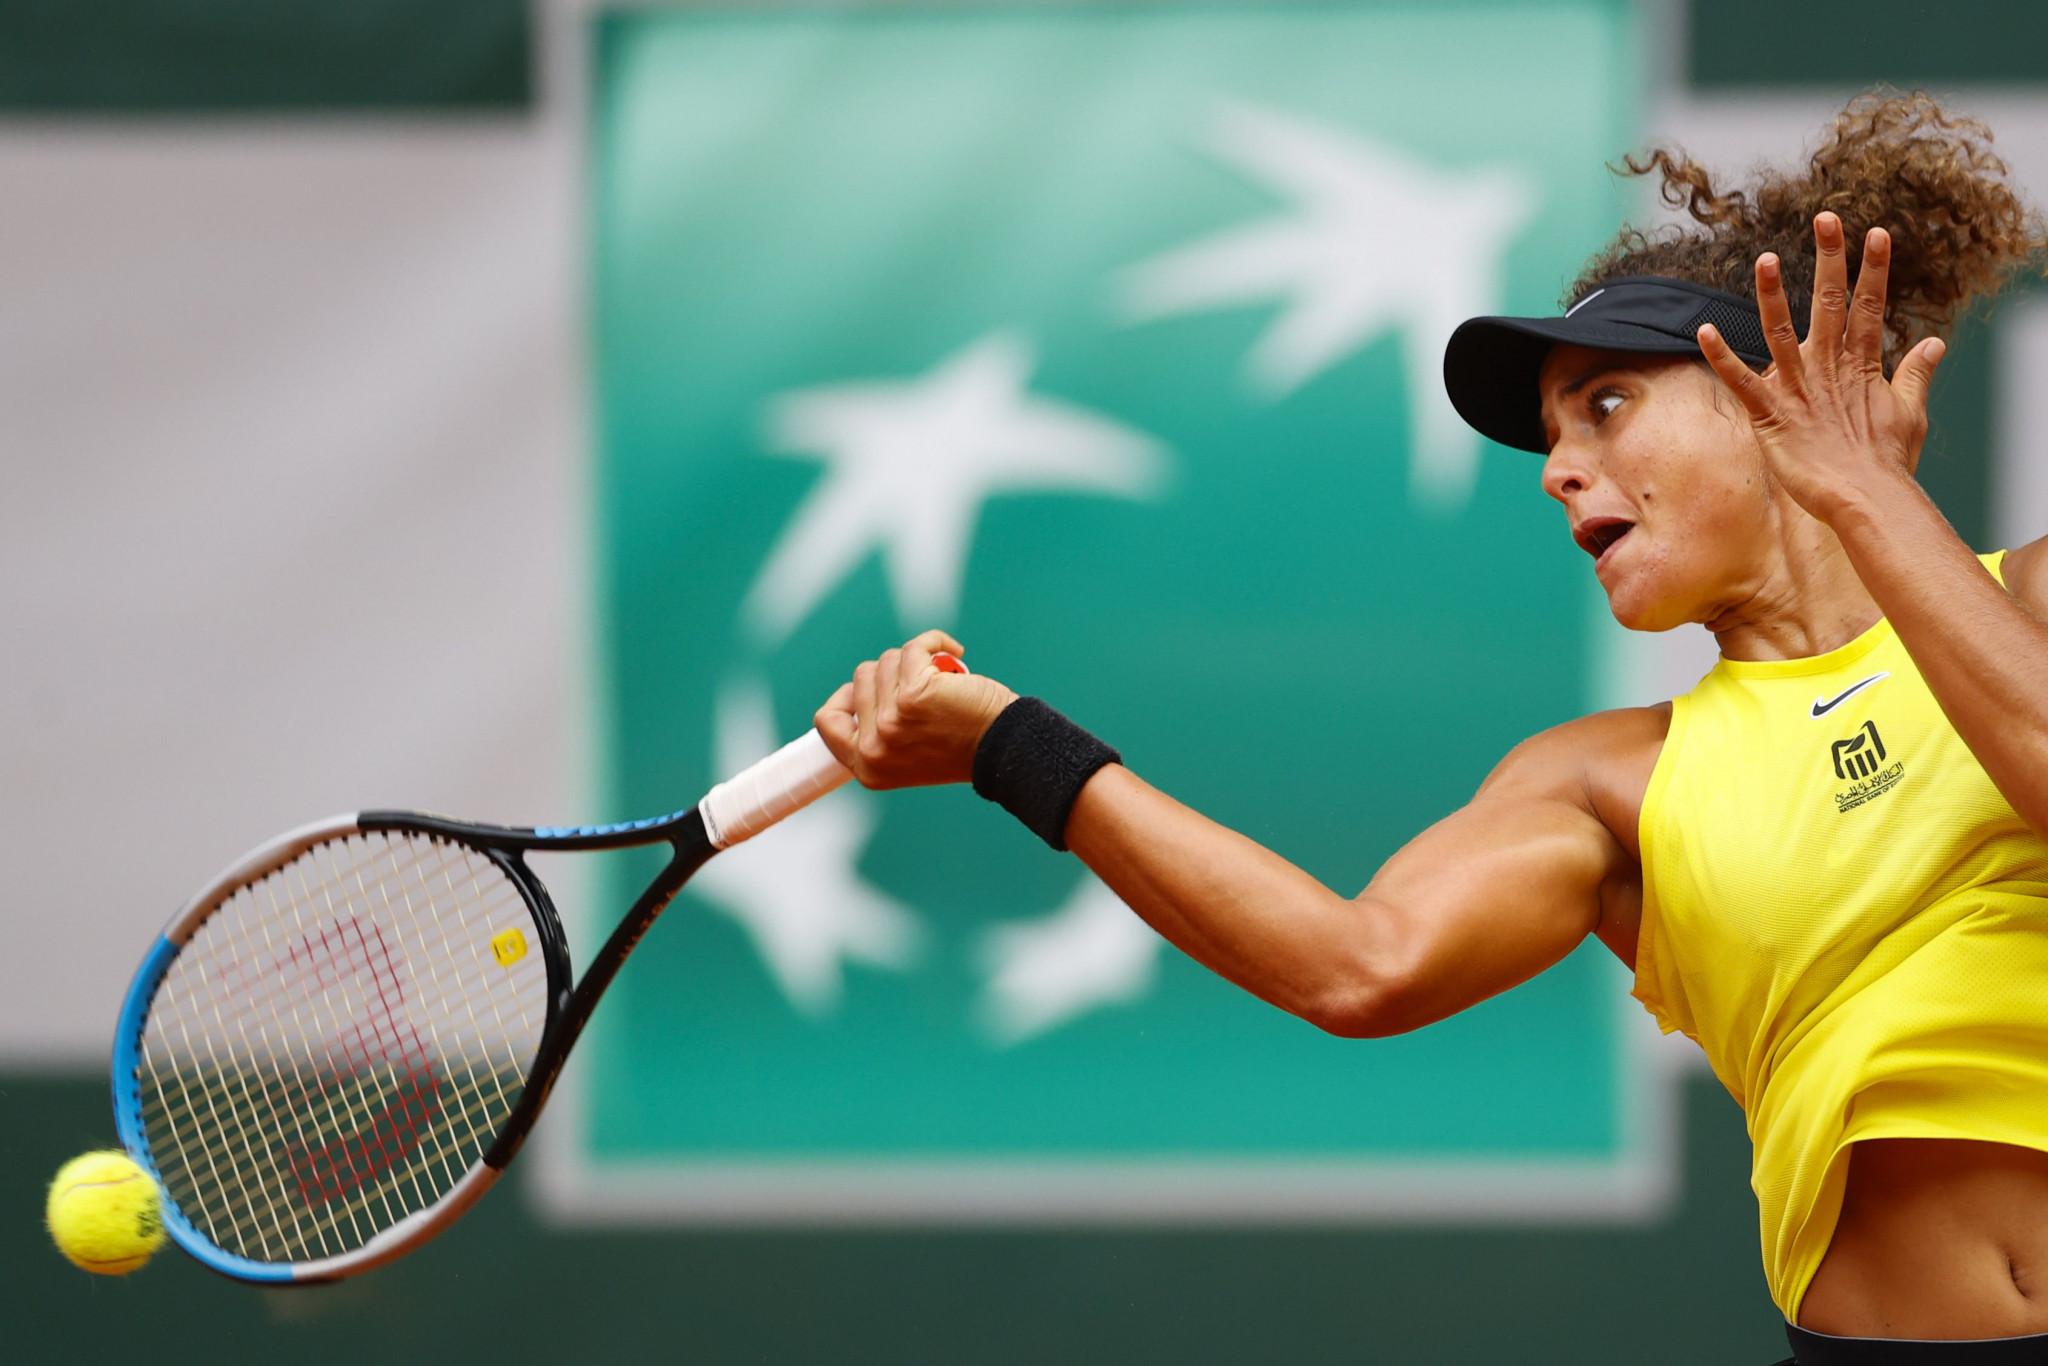 Grand Slam debutant Maya Sherif of Egypt took second seed Karolina Pliskova to three sets before the Czech player prevailed ©Getty Images